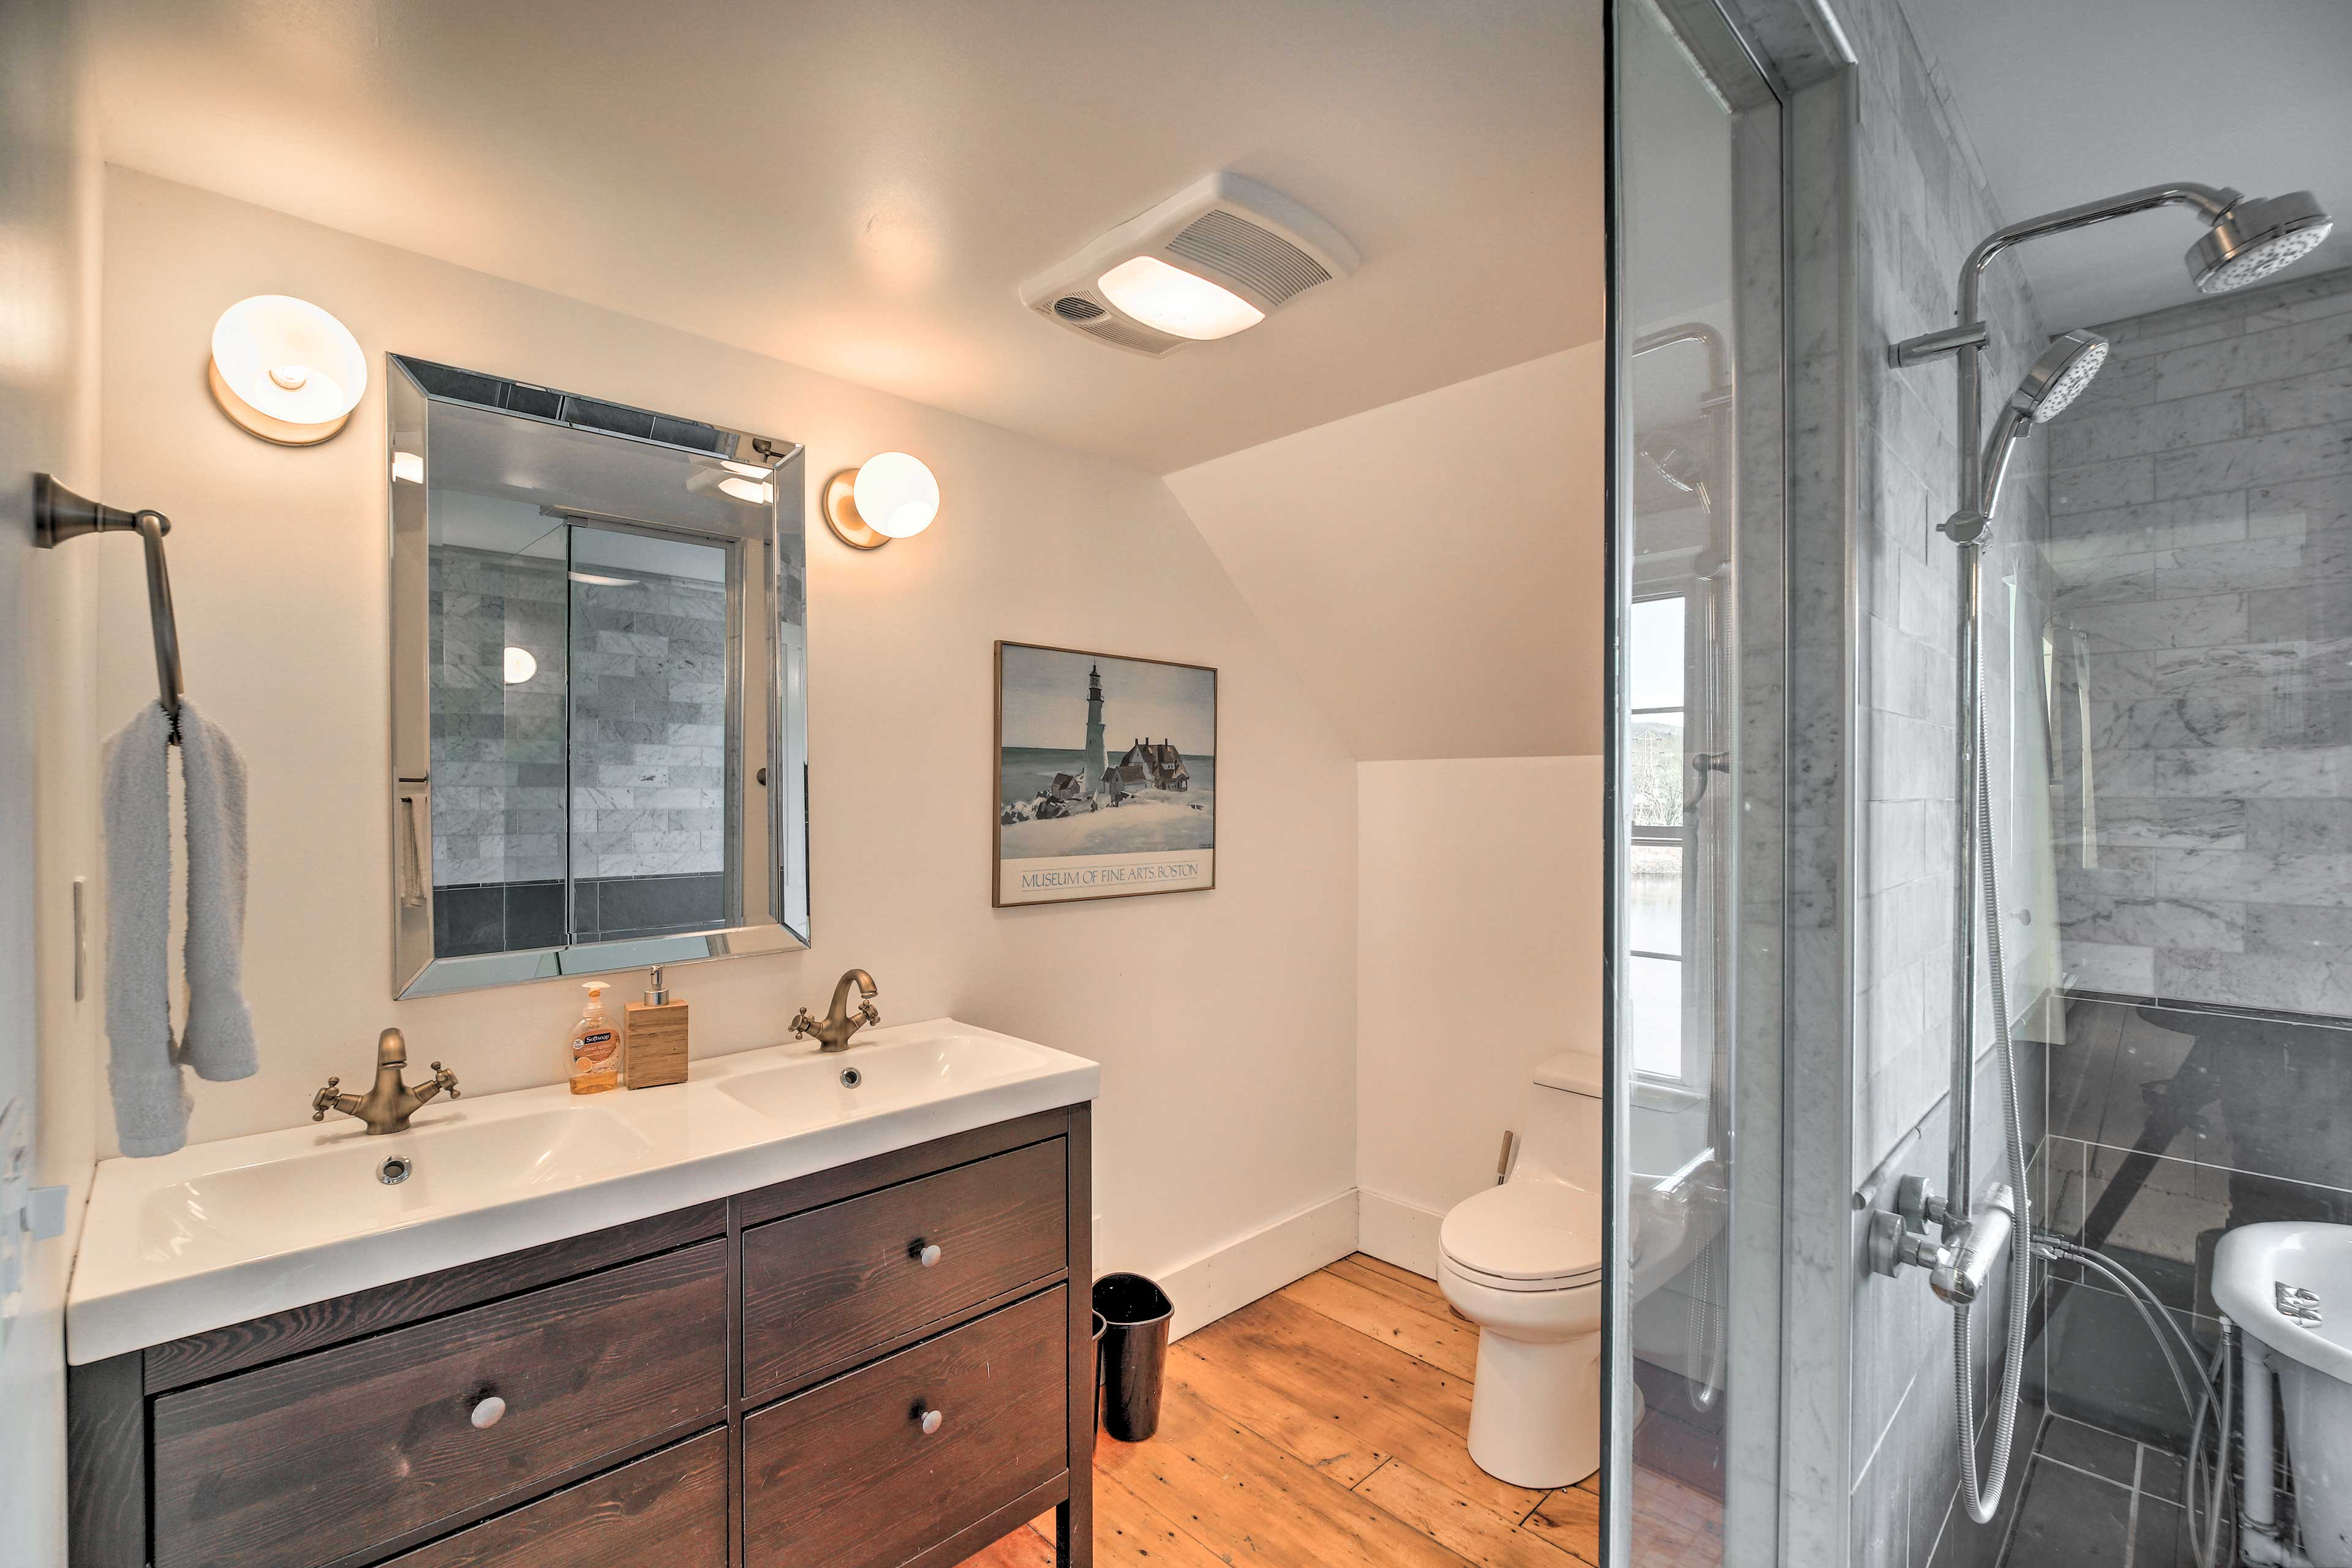 This luxury bathroom boasts double sinks.